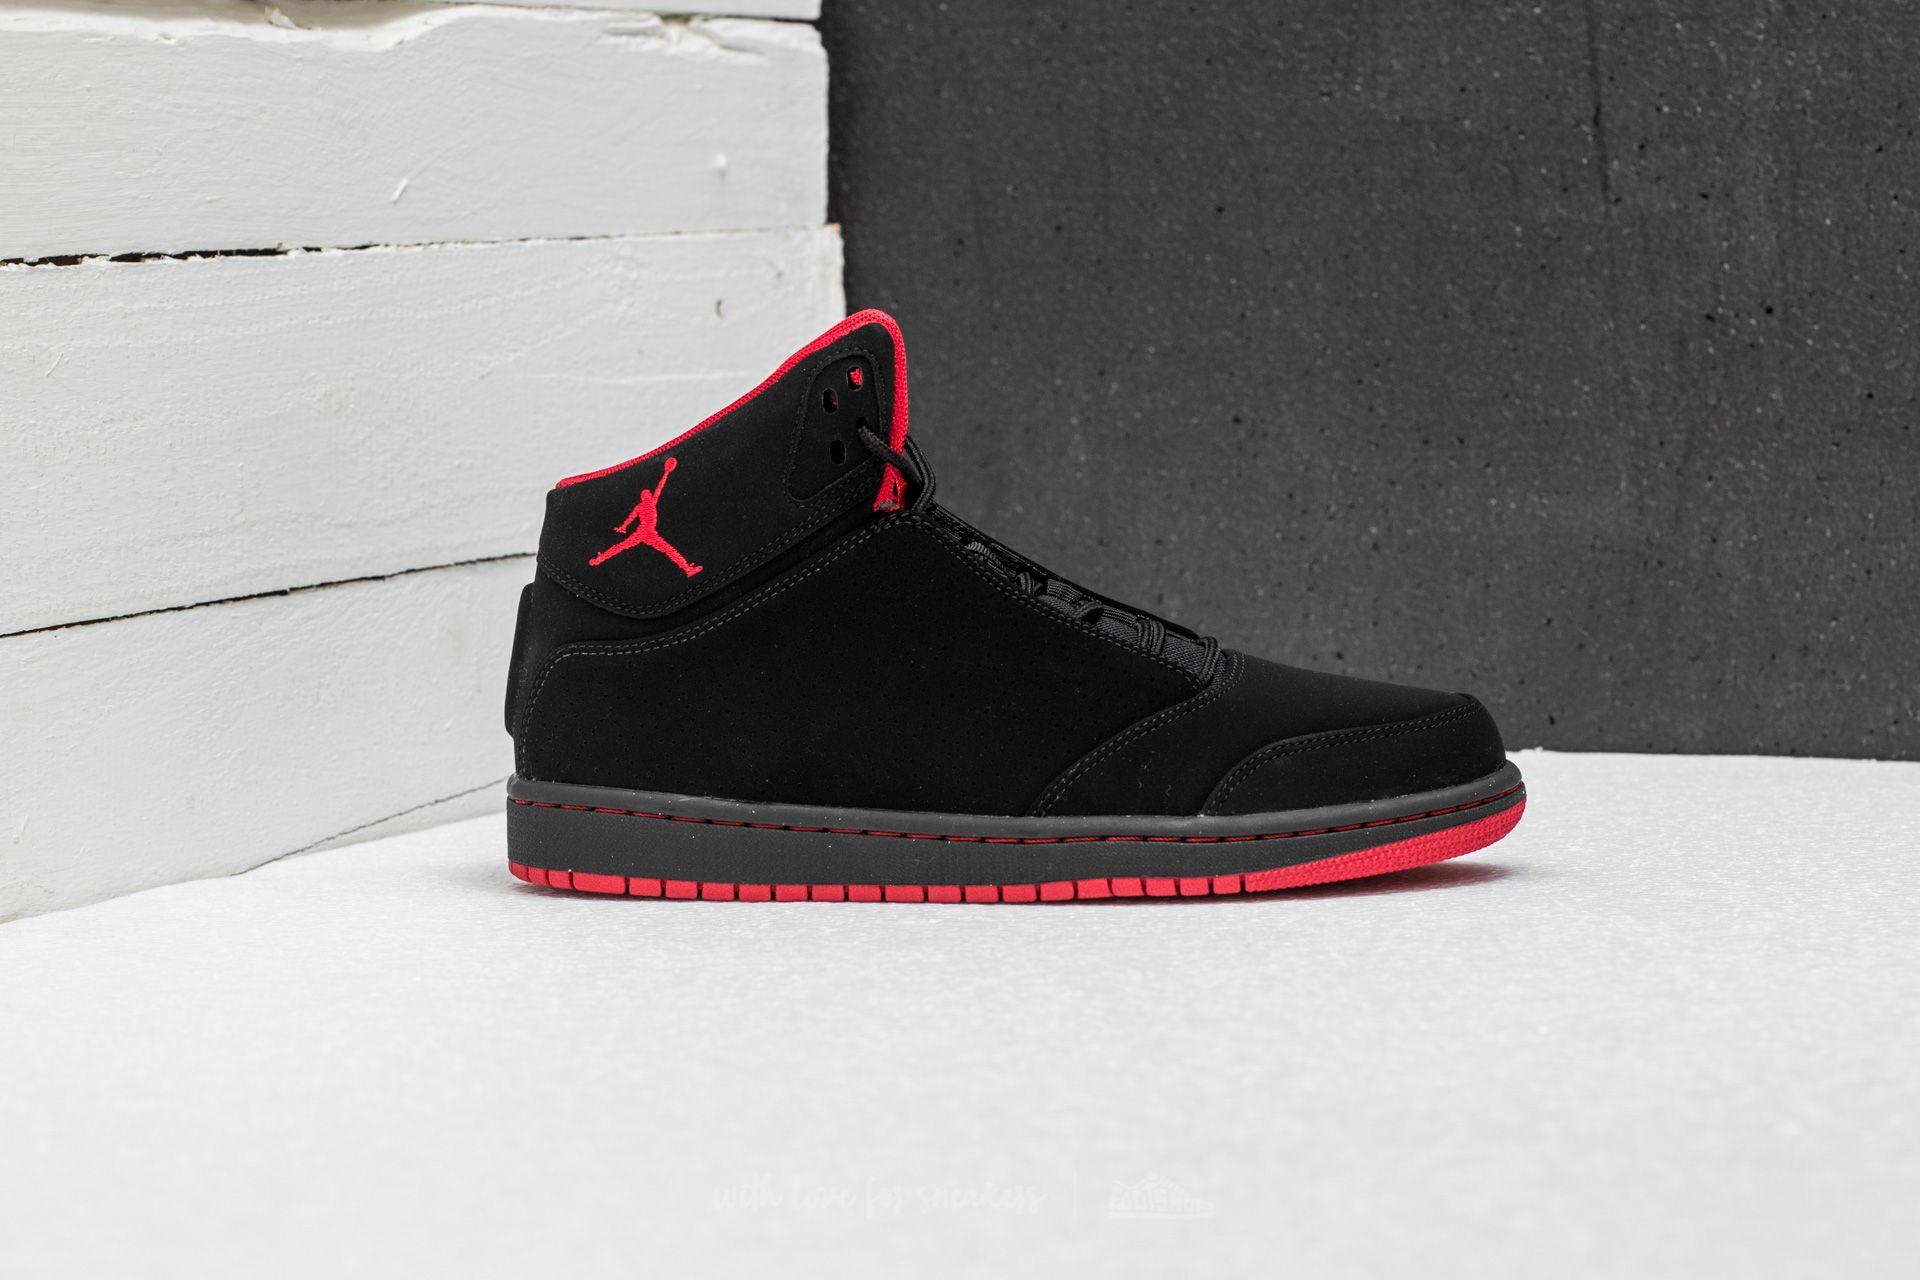 bas prix c73e0 22fbb Jordan 1 Flight 5 Black/ Gym Red | Footshop